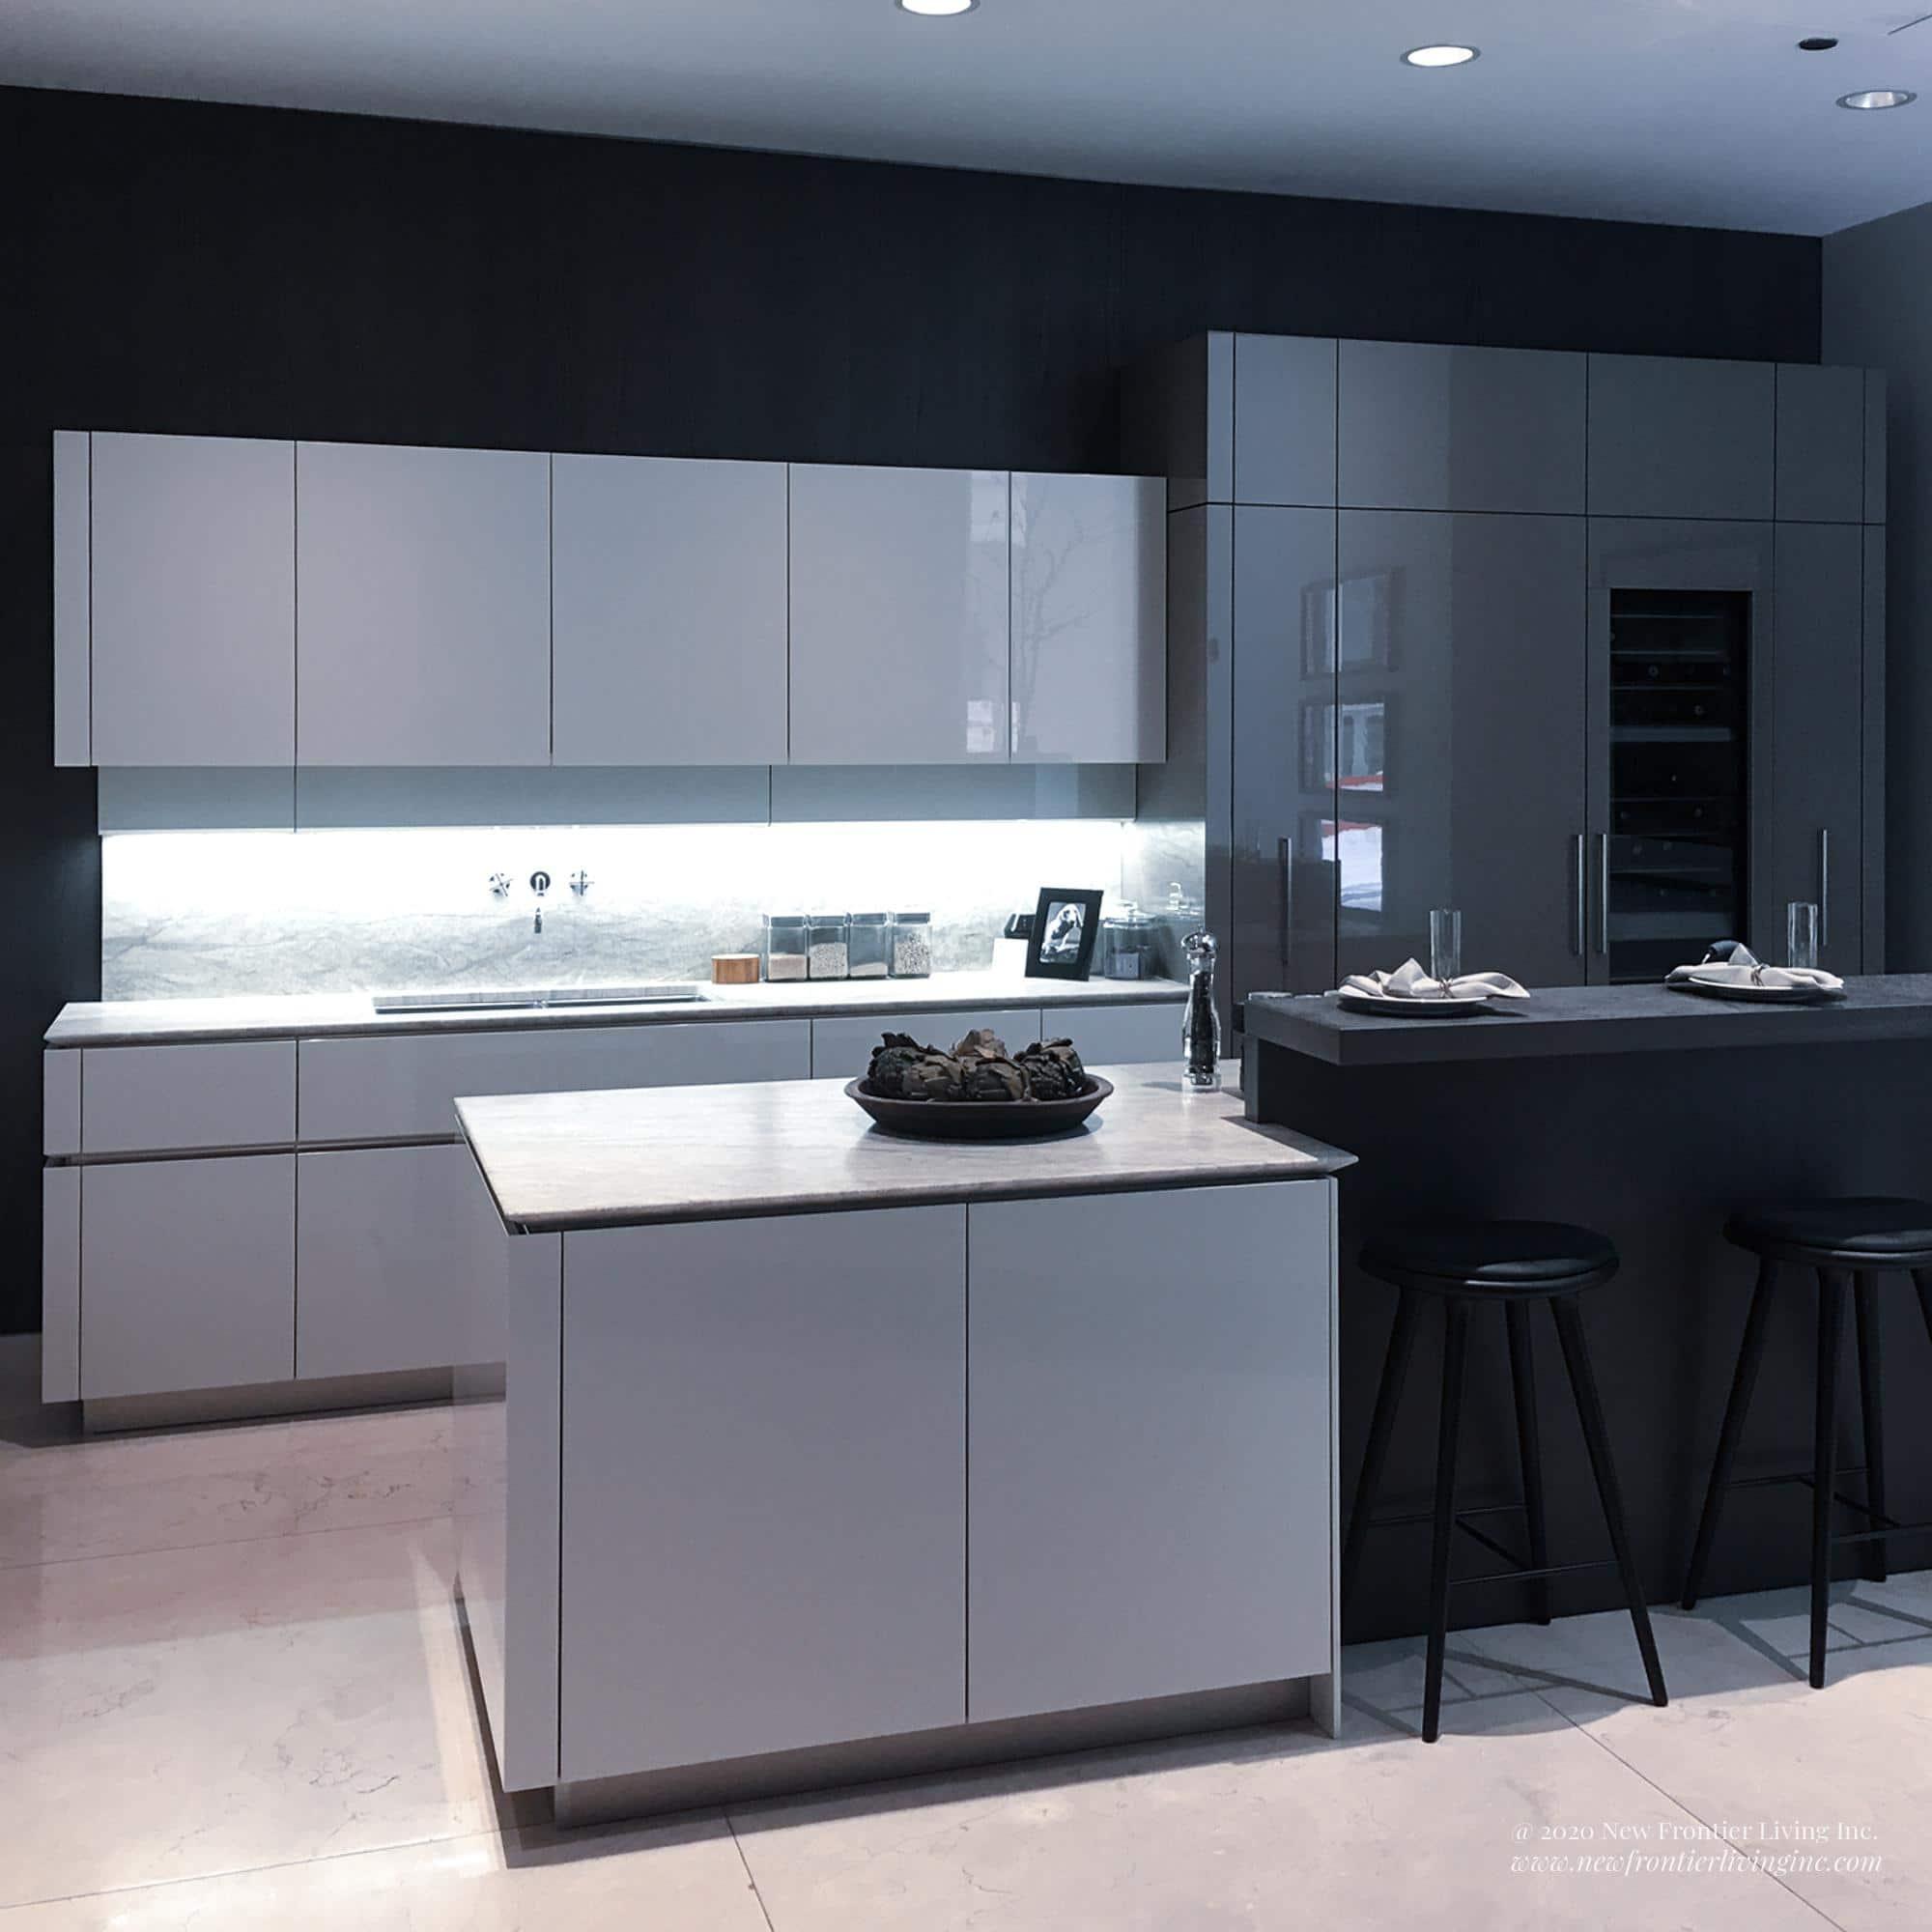 Alternative black and white kitchen islands